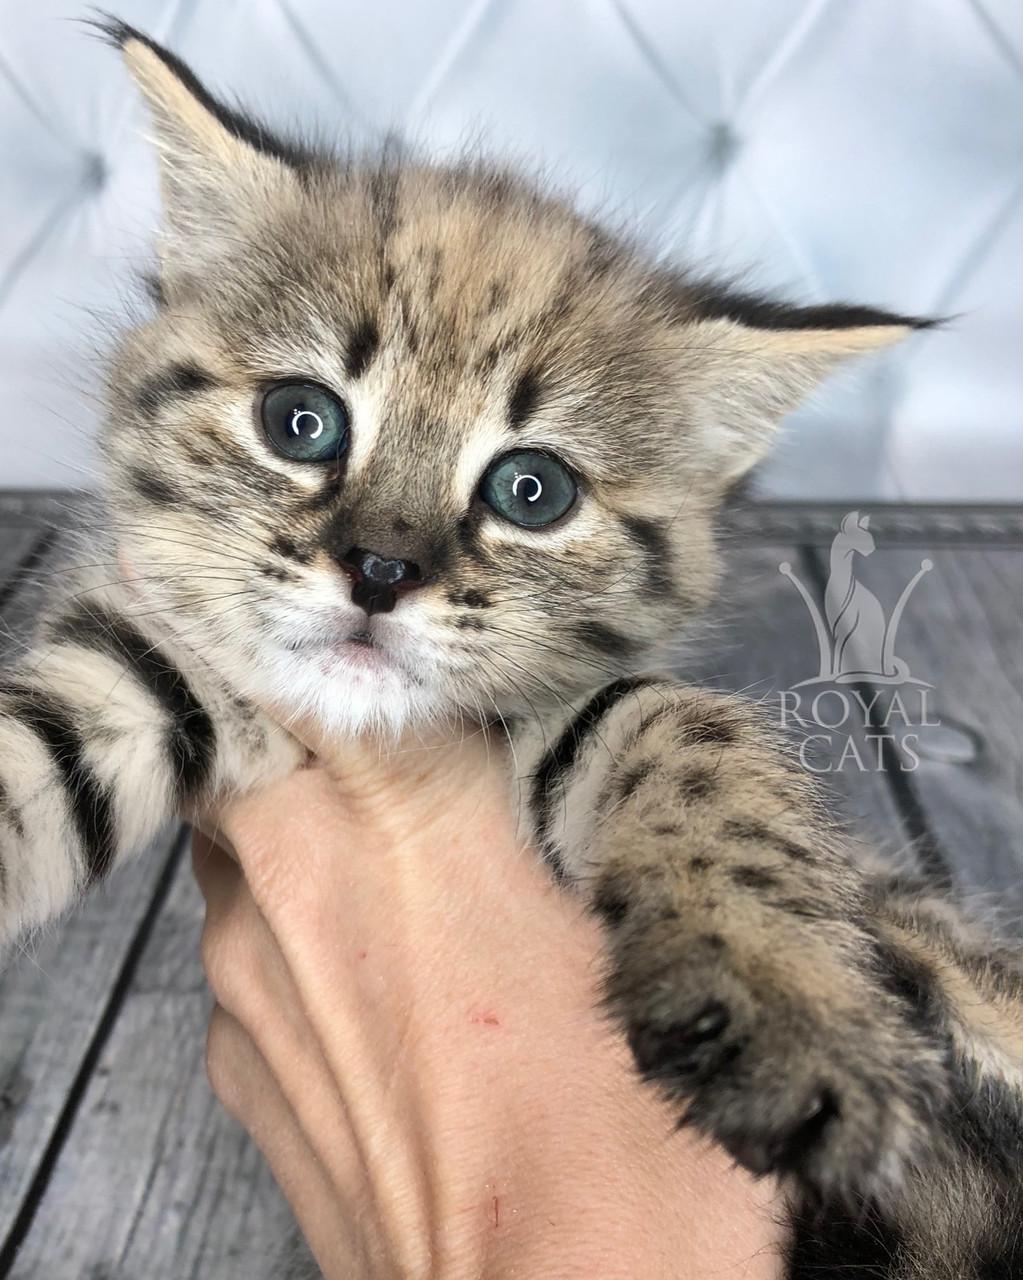 Кошечка Саванна Ф1 из украинского питомника Royal Cats (Девочка, 17/10/18)